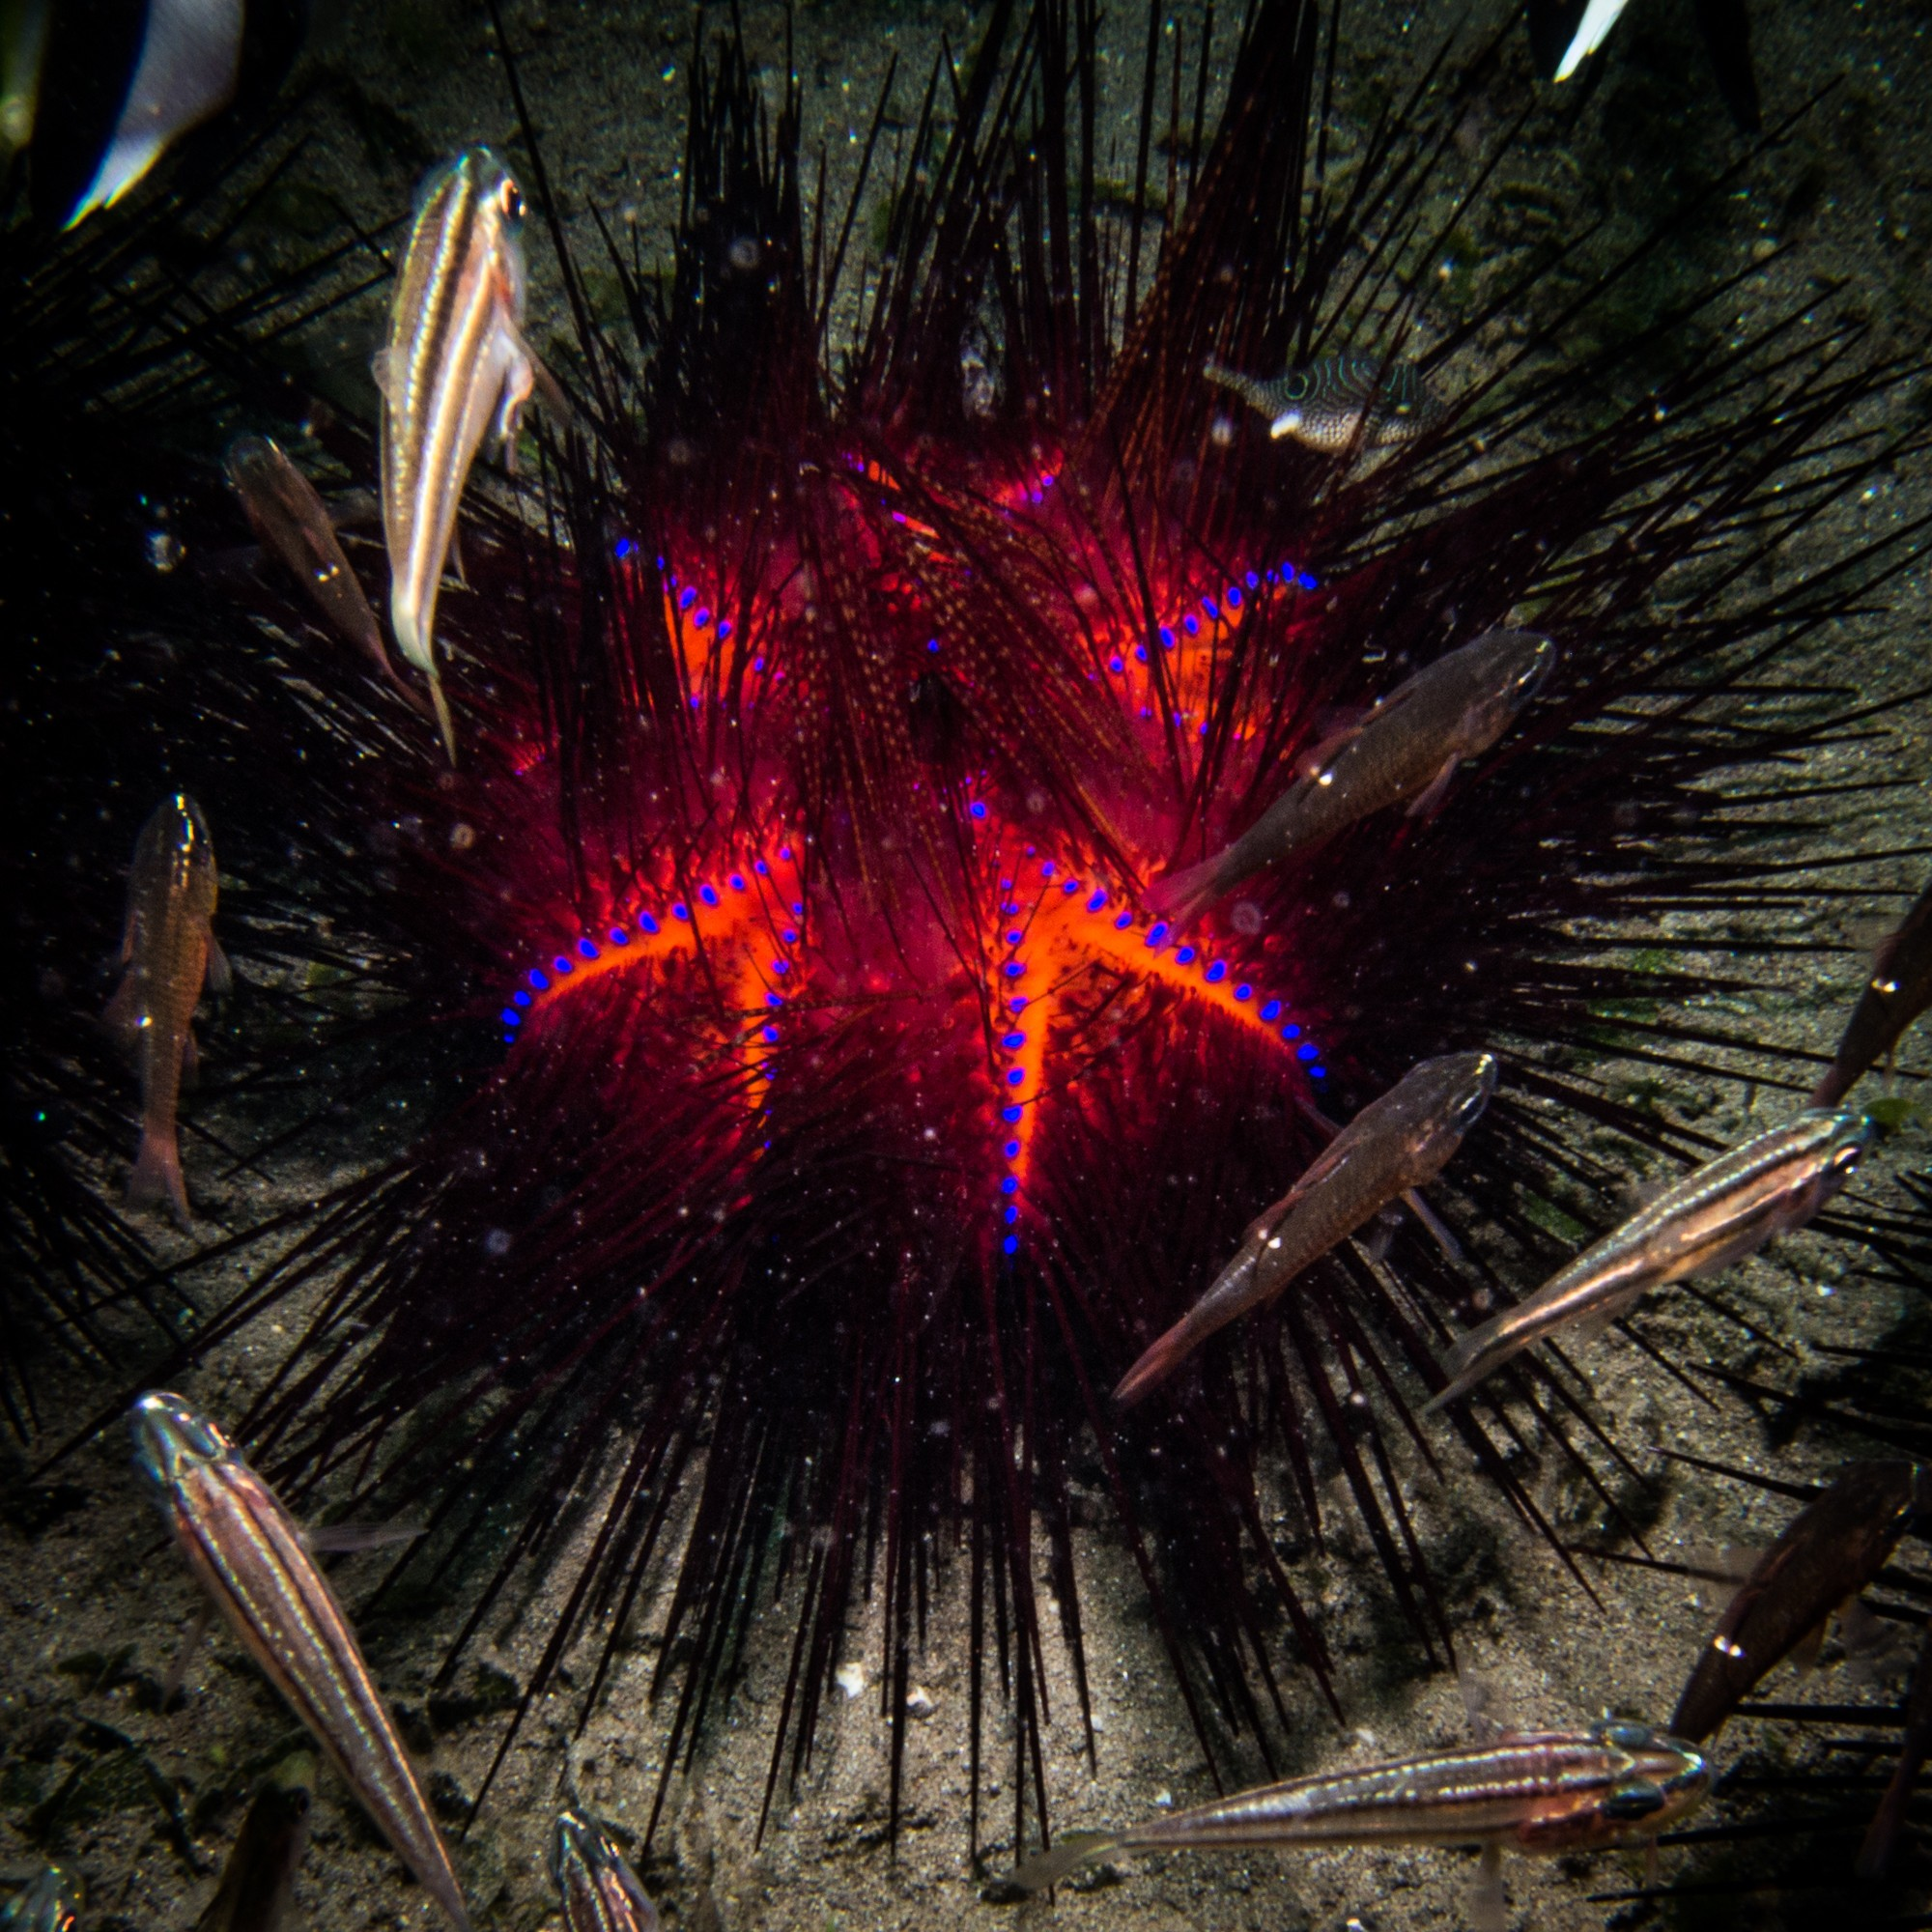 Waiterang wreck dive site Maumere fire sea urchin